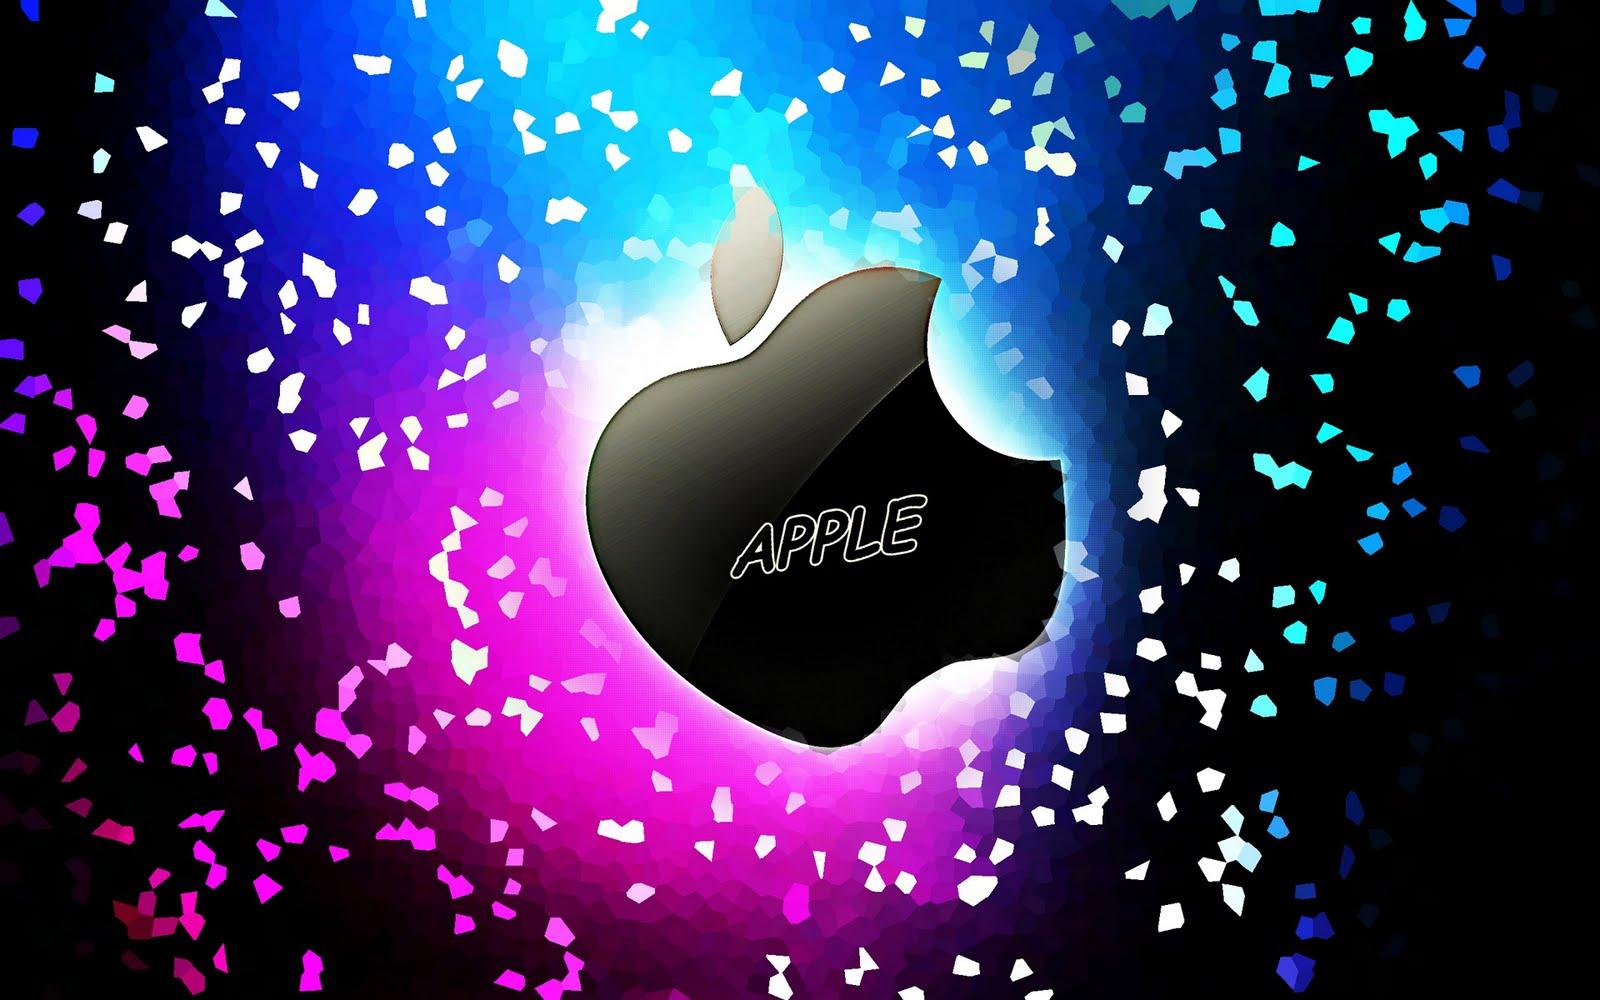 New Apple Wallpaper HQ Me Wallpaper 1600x1000